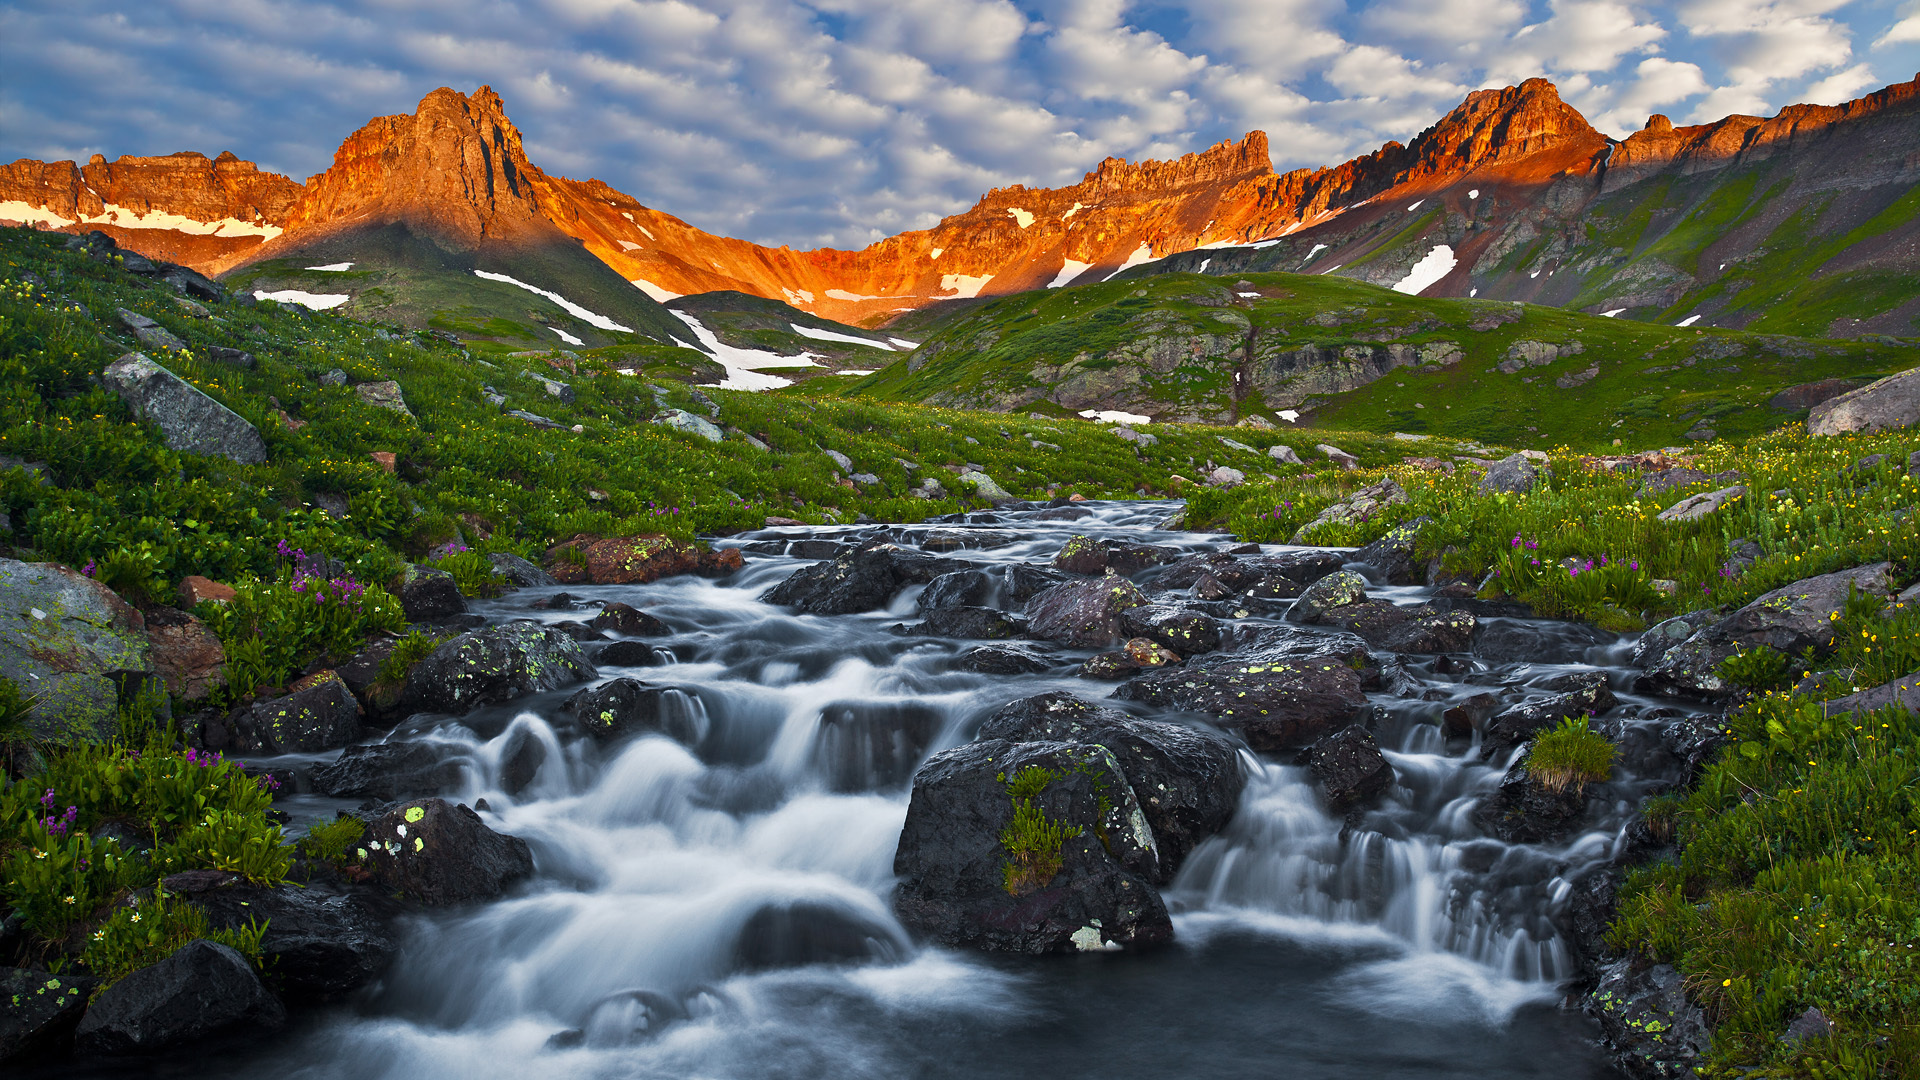 Lake Basin at dawn San Juan Mountains Colorado   Desktop Wallpaper 1920x1080